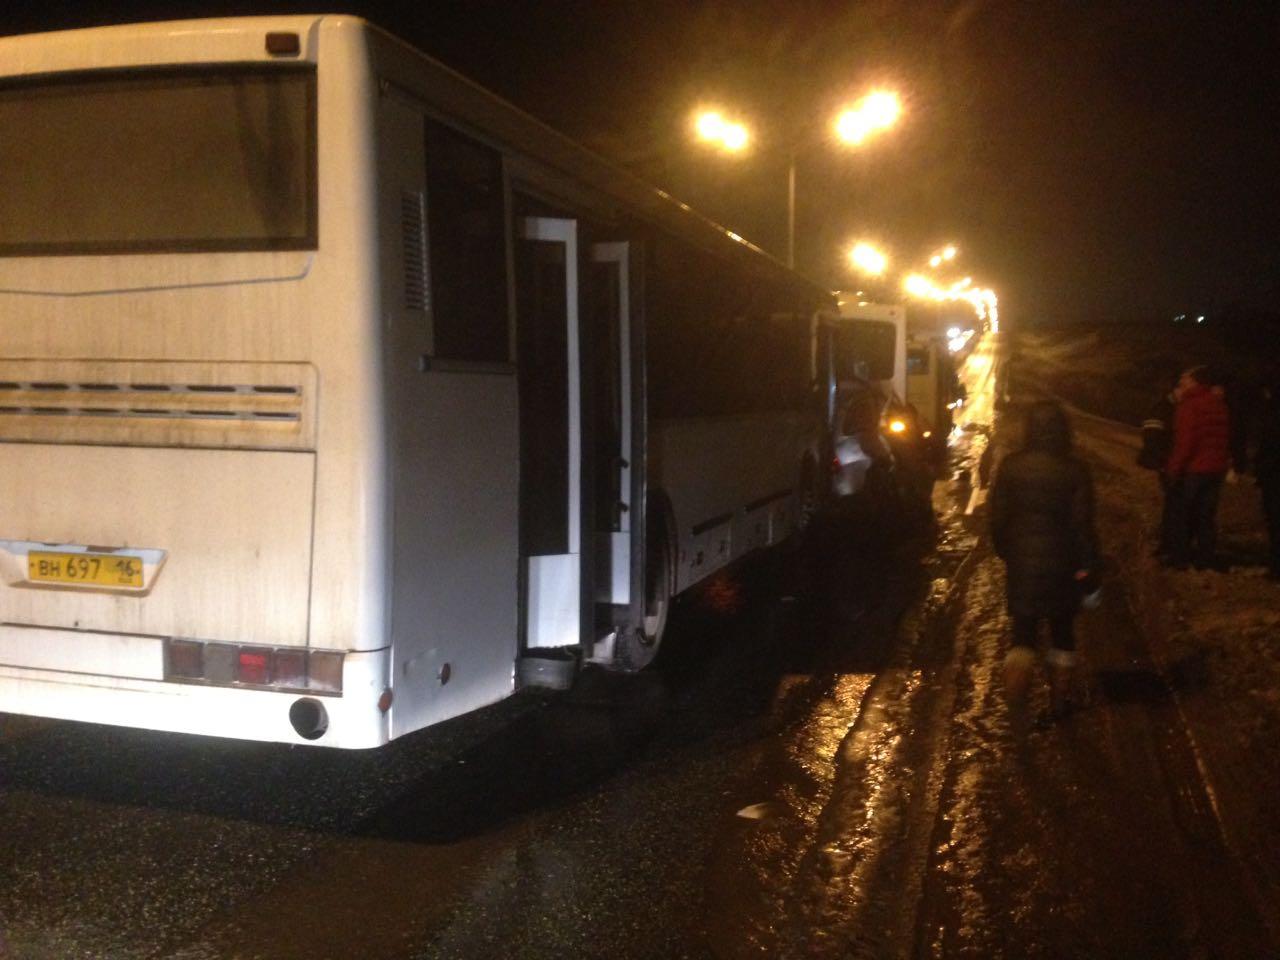 ВТатарстане вДТП «Калину» зажало между автобусами